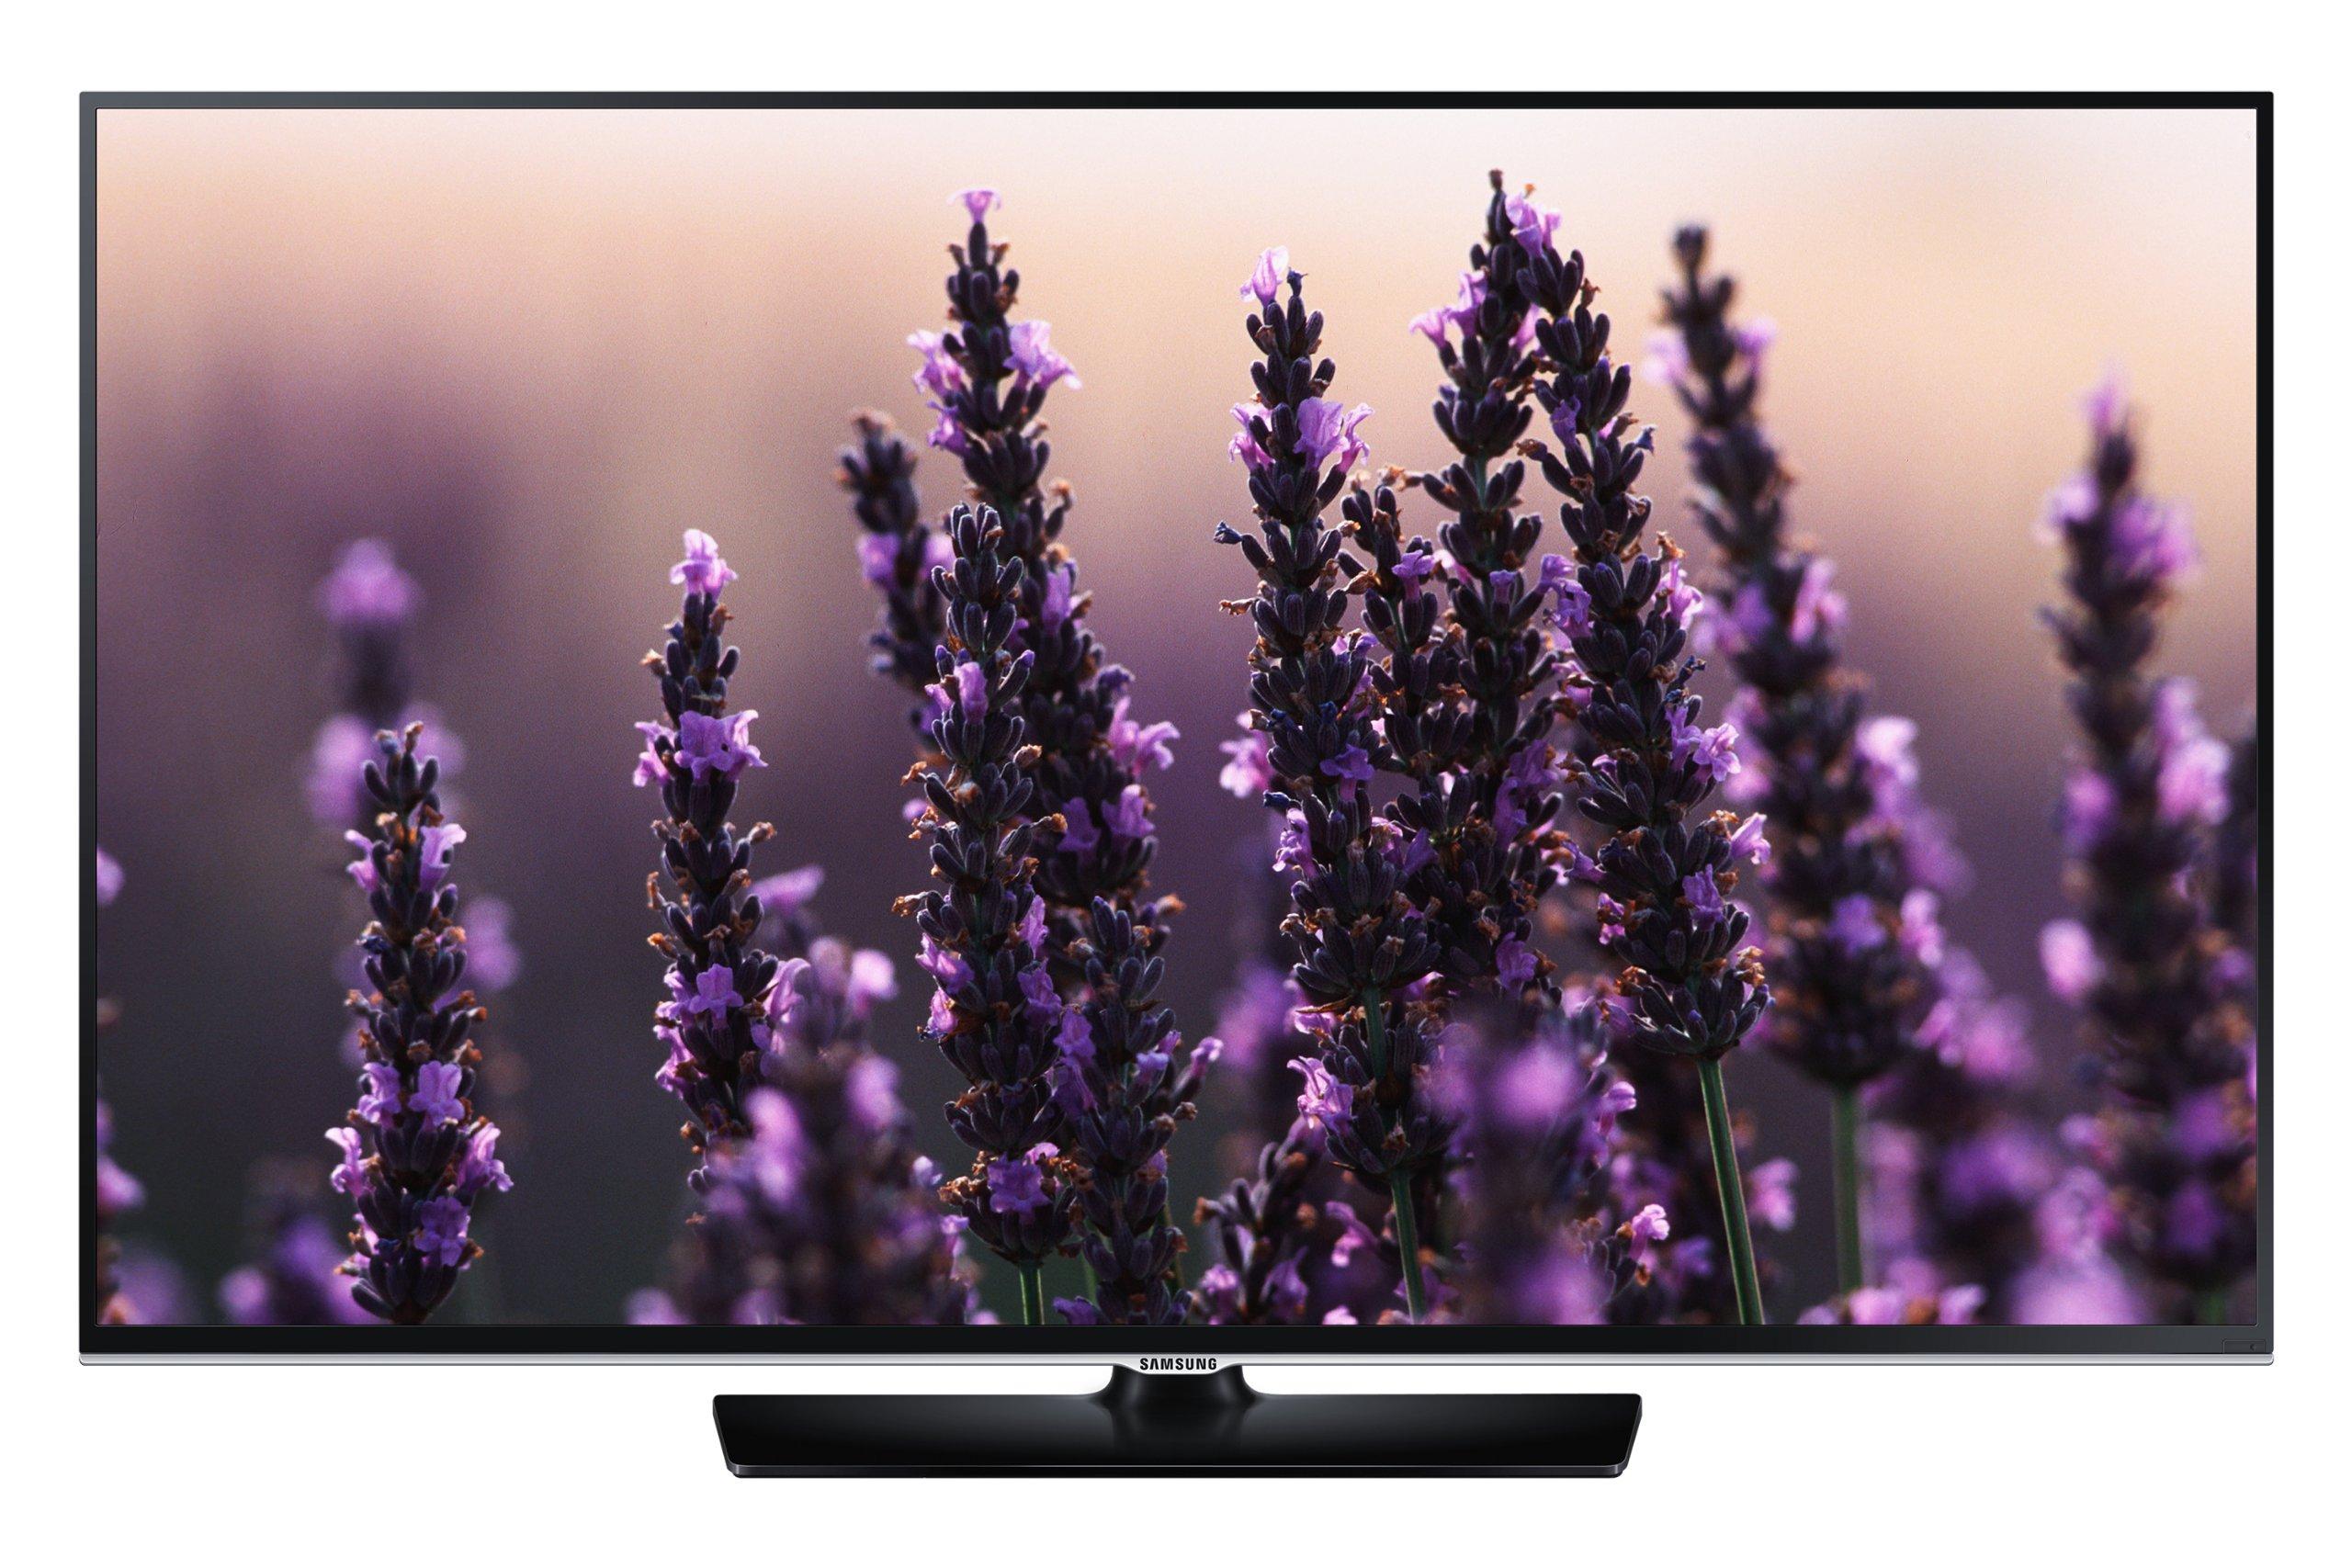 Samsung UE48H5500AW 48 Full HD Smart TV WiFi Negro - Televisor (1.4a, Full HD, A++, 16:9, 1920 x 1080 (HD 1080), 1080p): Amazon.es: Electrónica